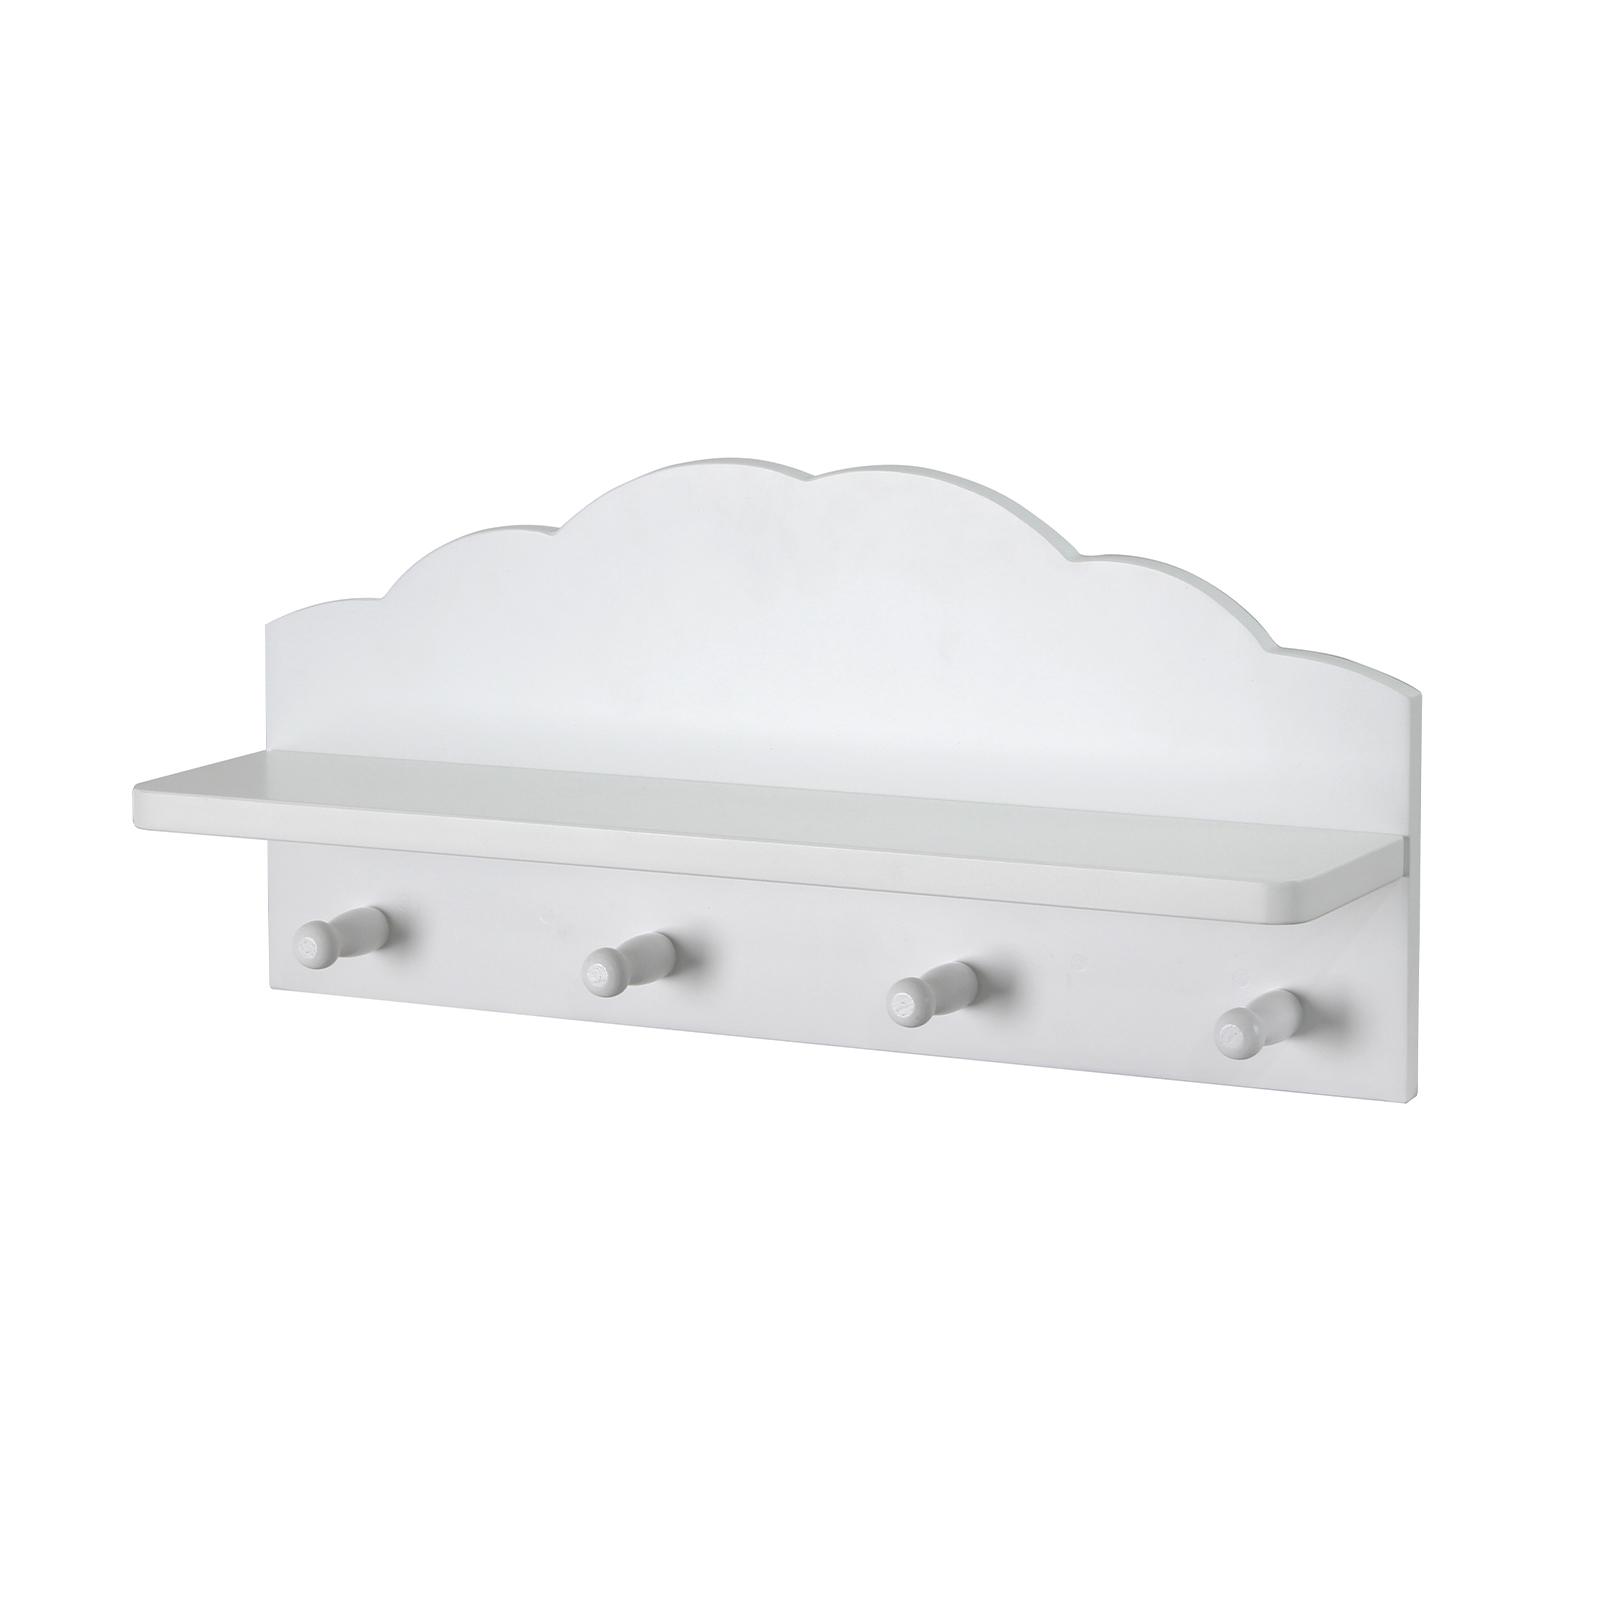 Flexi Storage Kids 400mm White Cloud Floating Shelf With Hooks